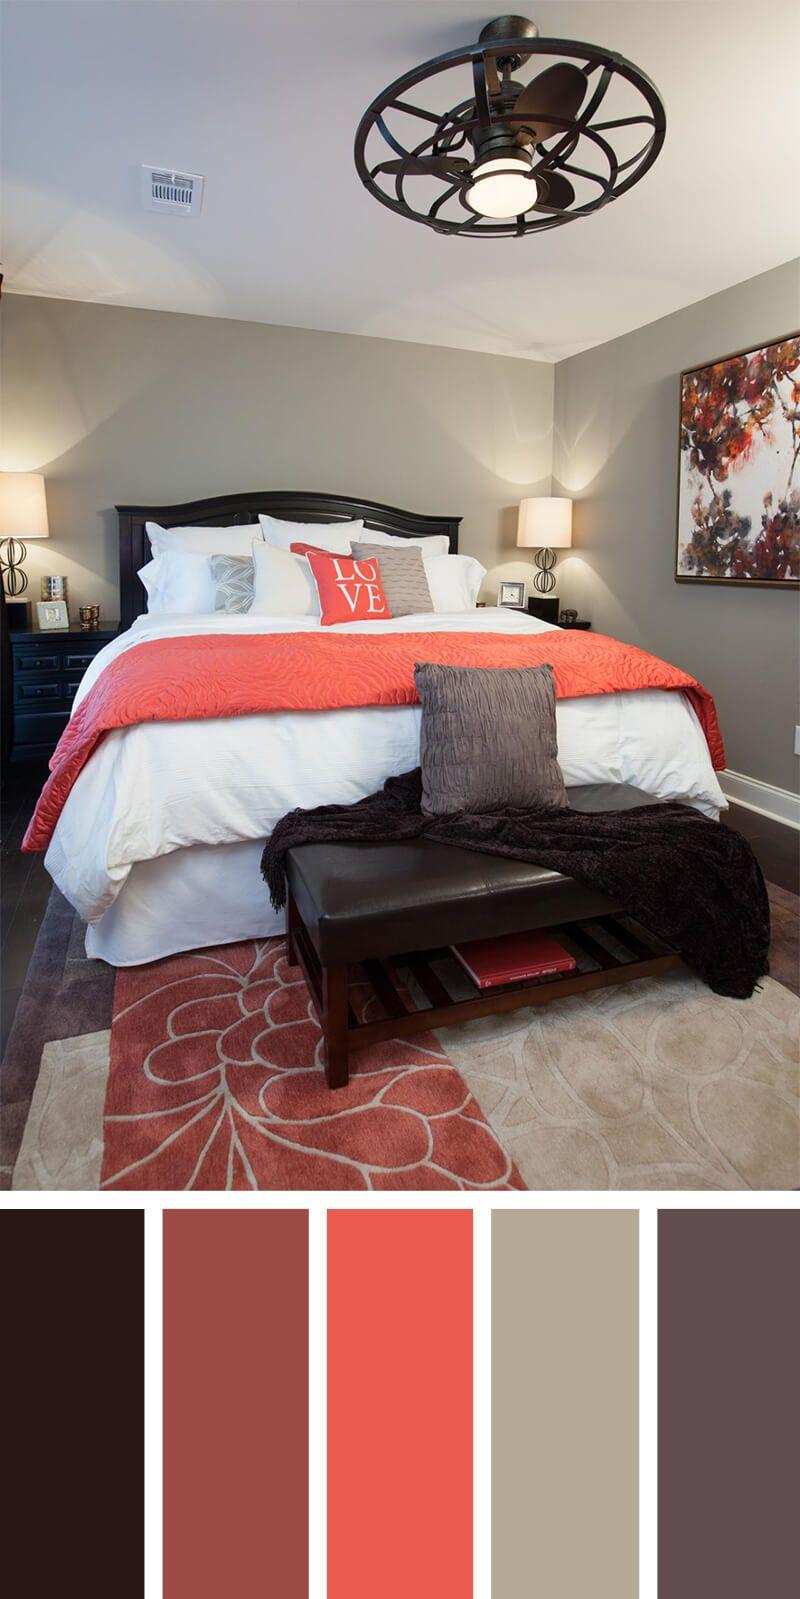 12 Gorgeous Bedroom Color Scheme Ideas To Create A Magazine Worthy Boudoir Bedroom Color Combination Beautiful Bedroom Colors Best Bedroom Colors